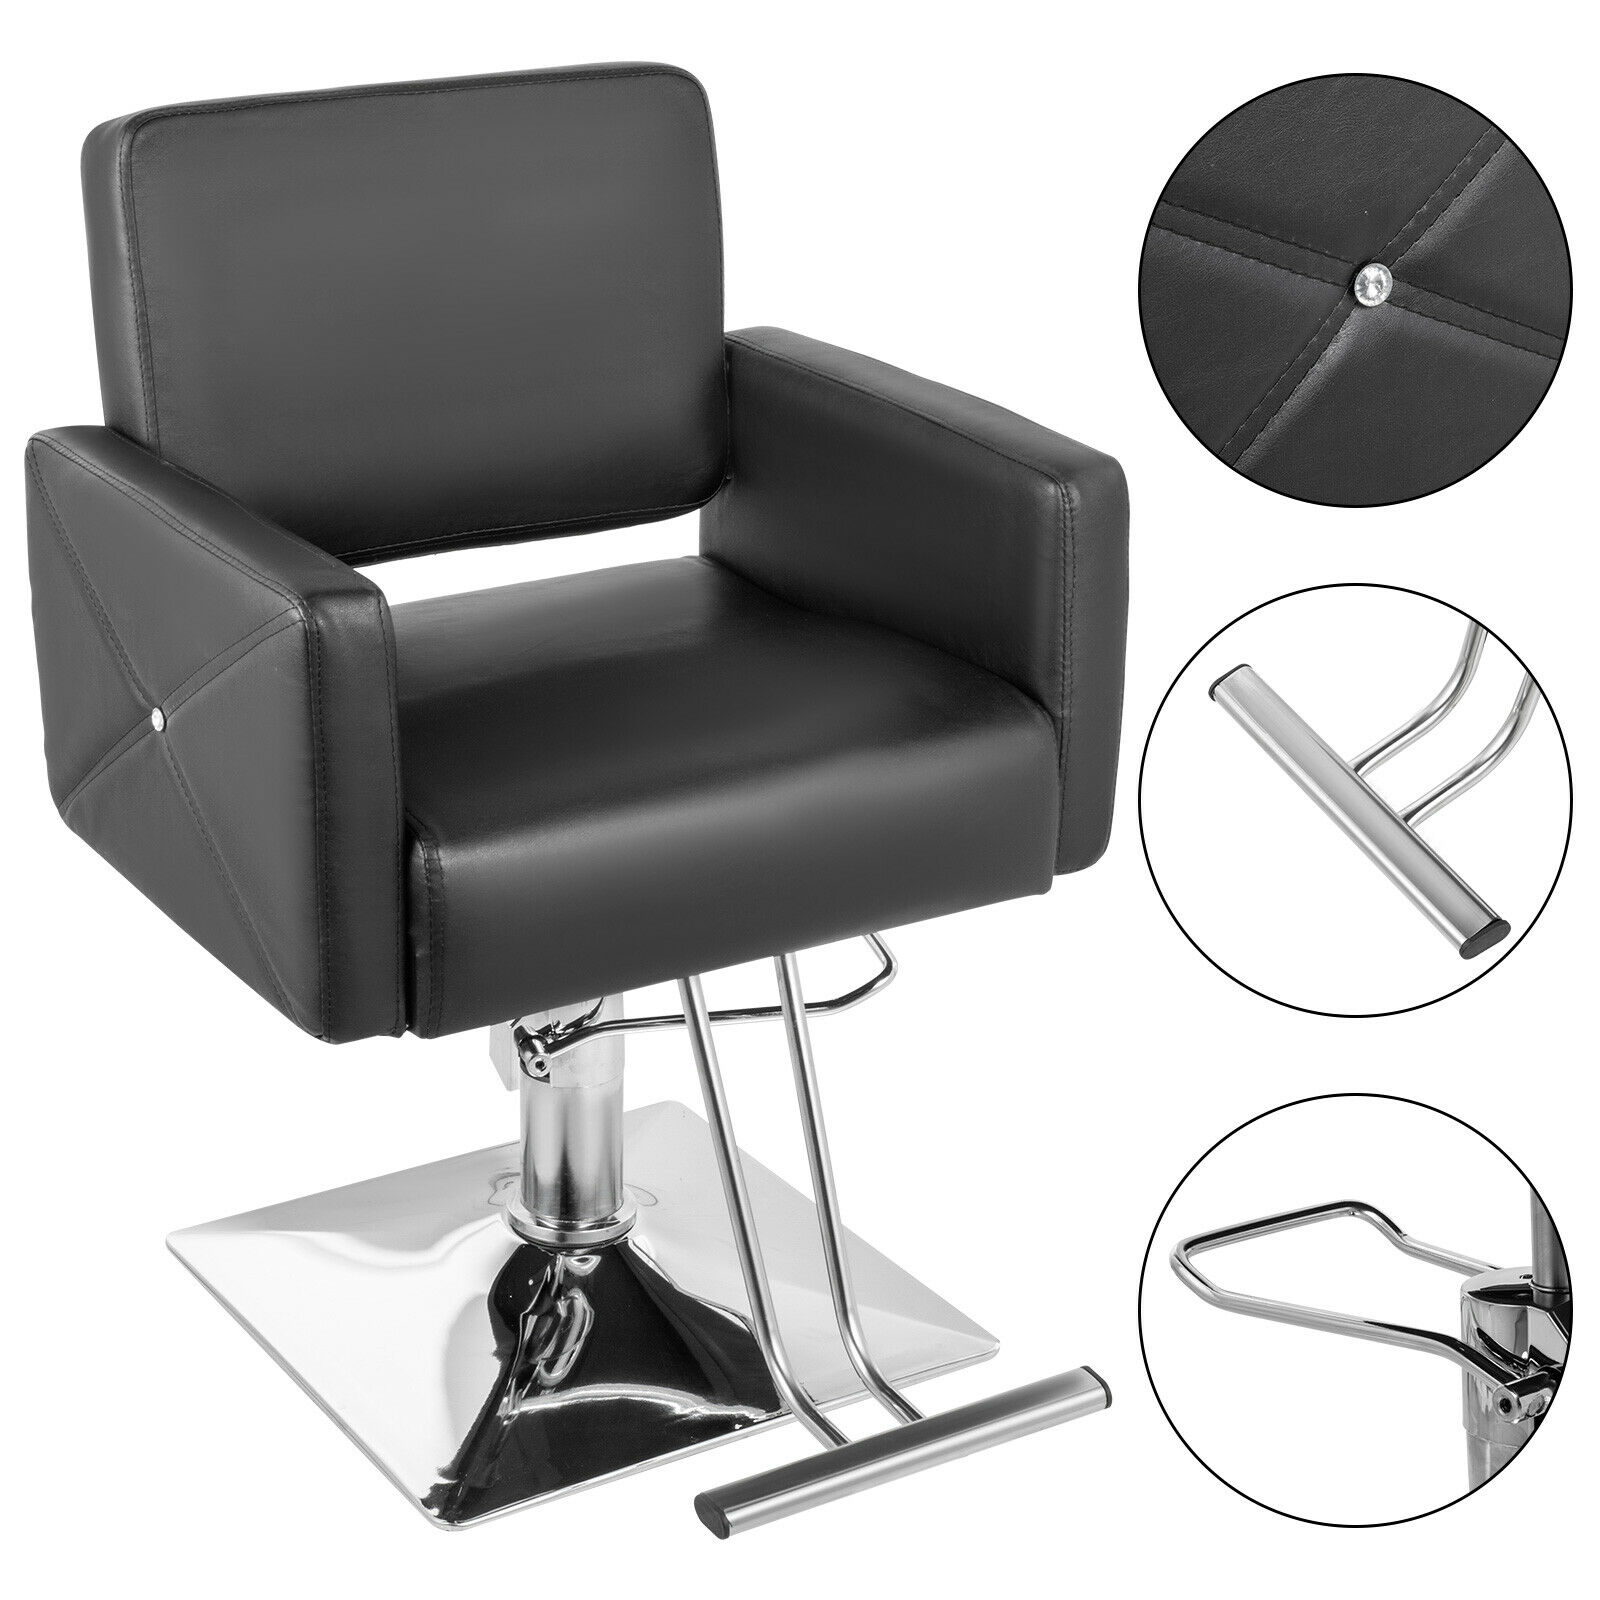 Salon Chair Classic Hydraulic Barber Hair Styling Beauty Spa Shampoo Equipment